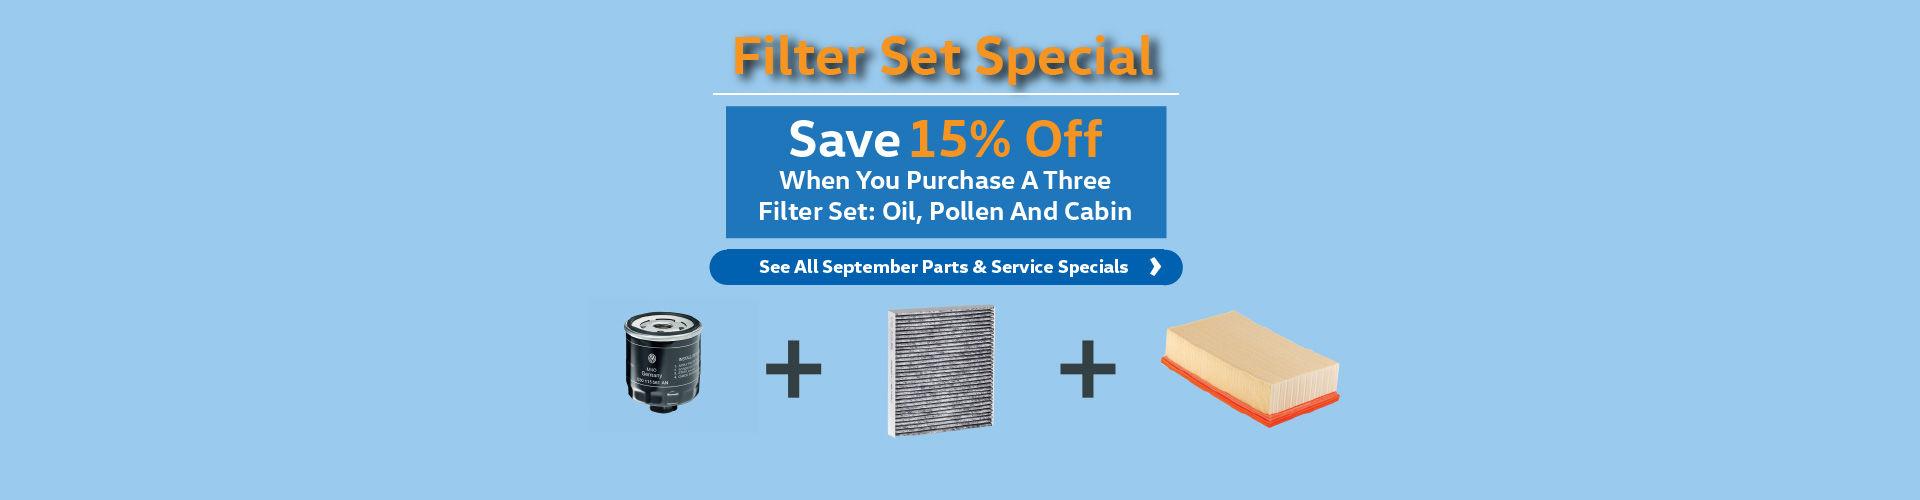 Filter Set Special